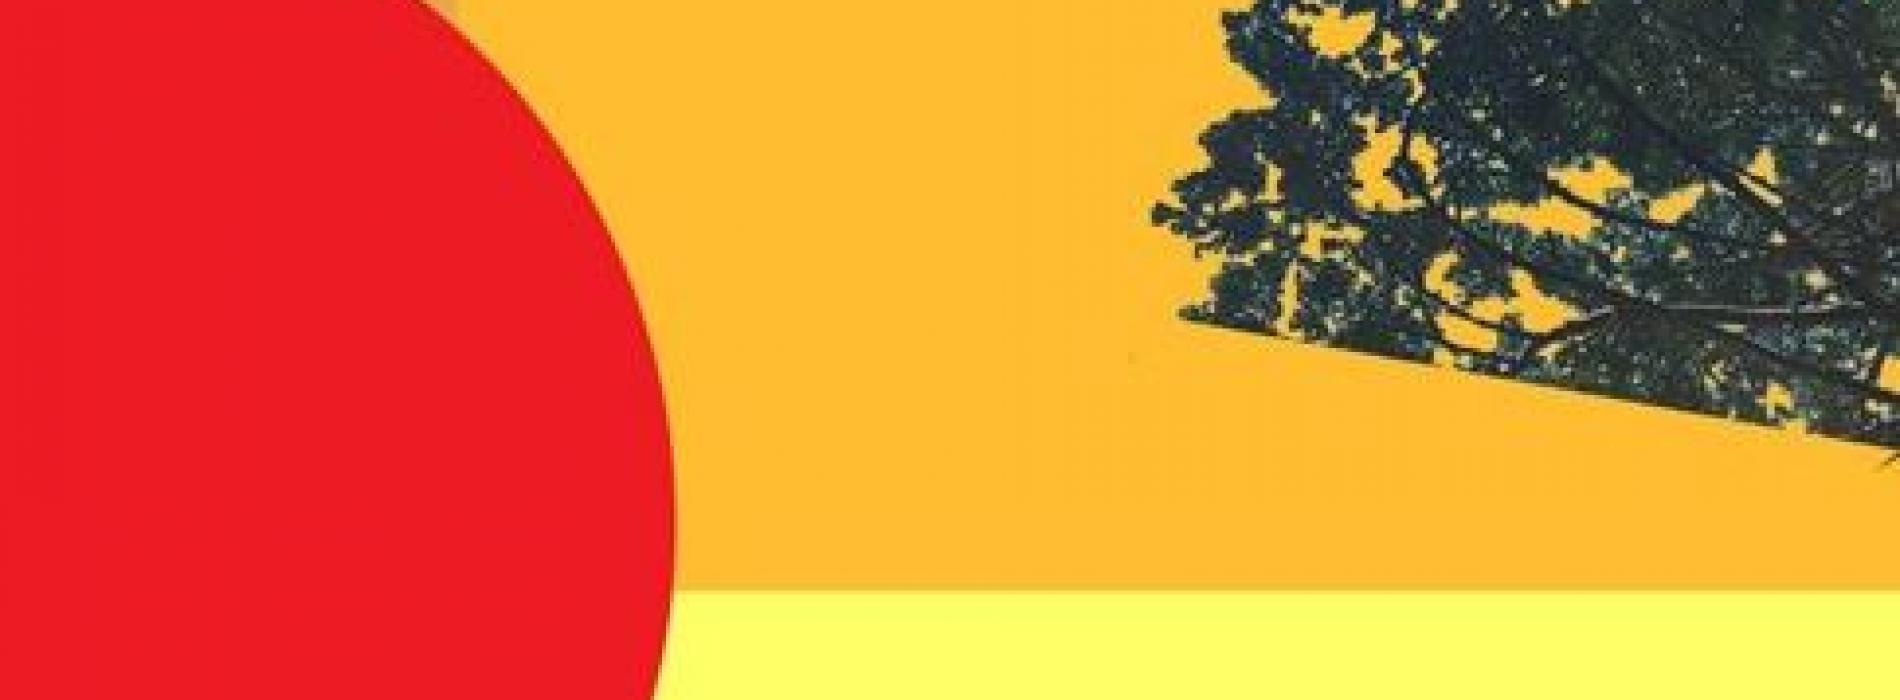 Owl Tree-O – On And On